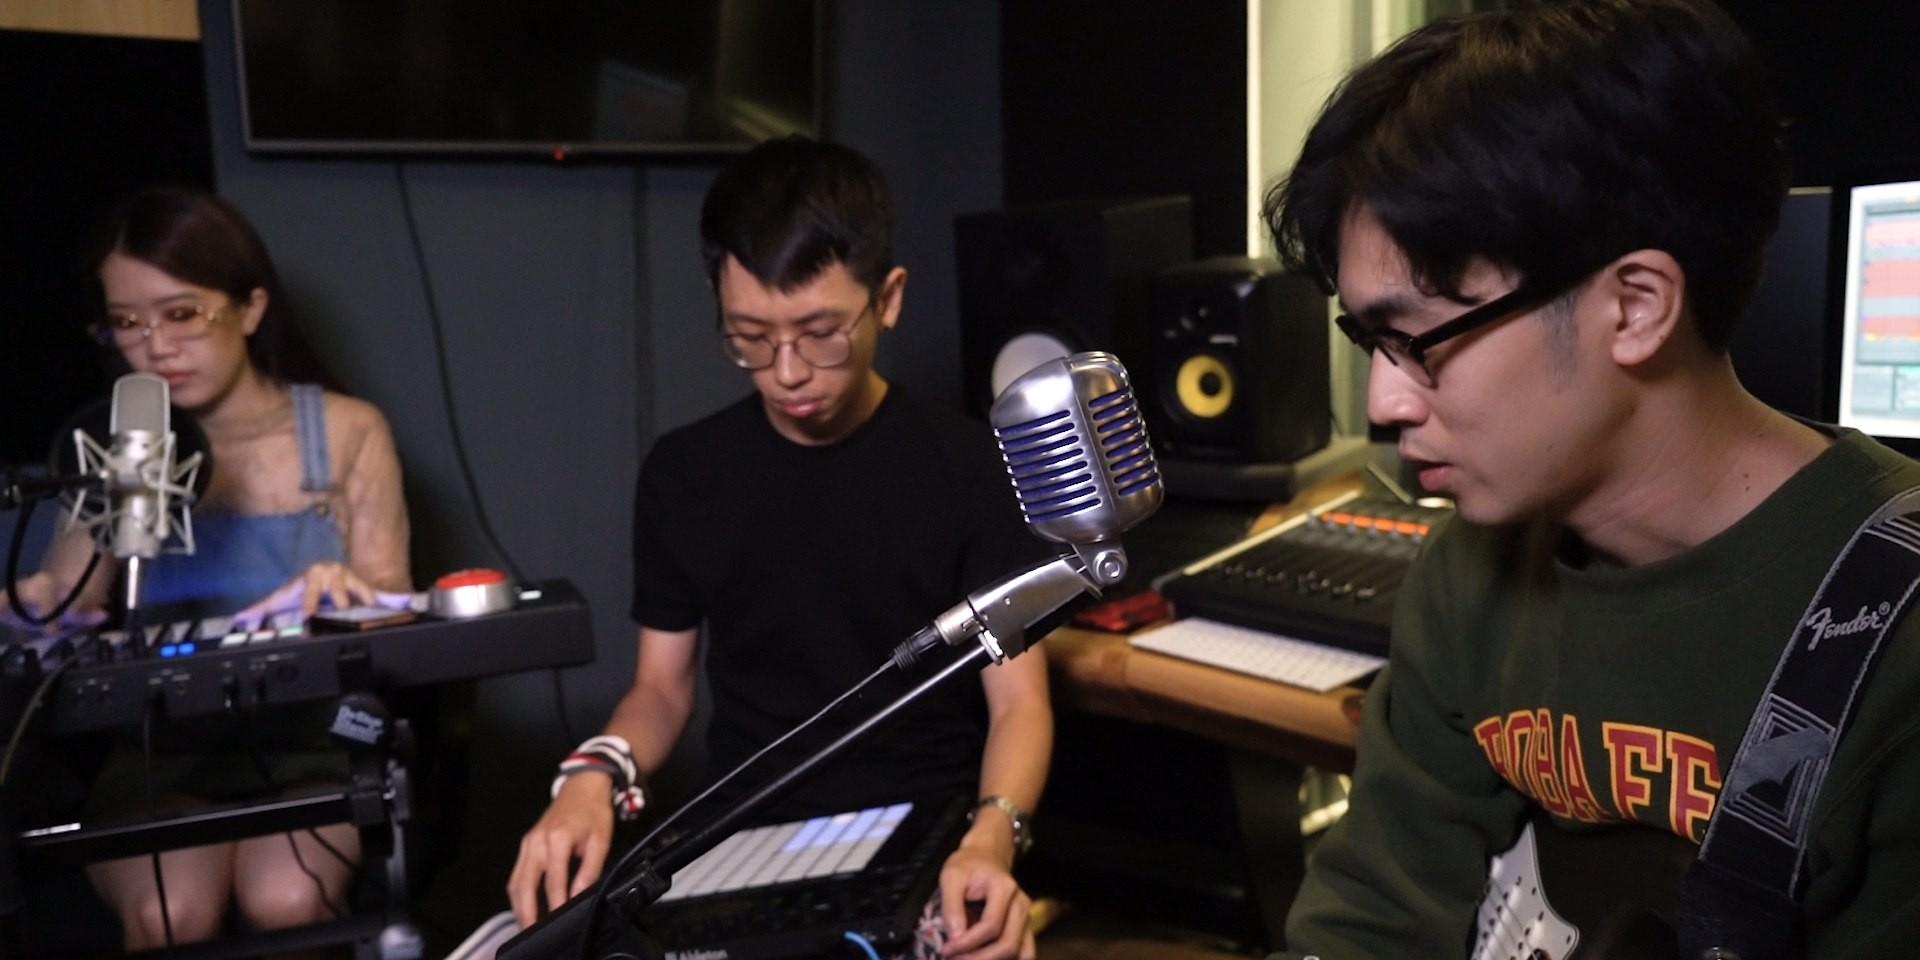 Evanturetime, Linying and Charlie Lim perform 'Vultures' live in studio for Bandwagon Presents – watch